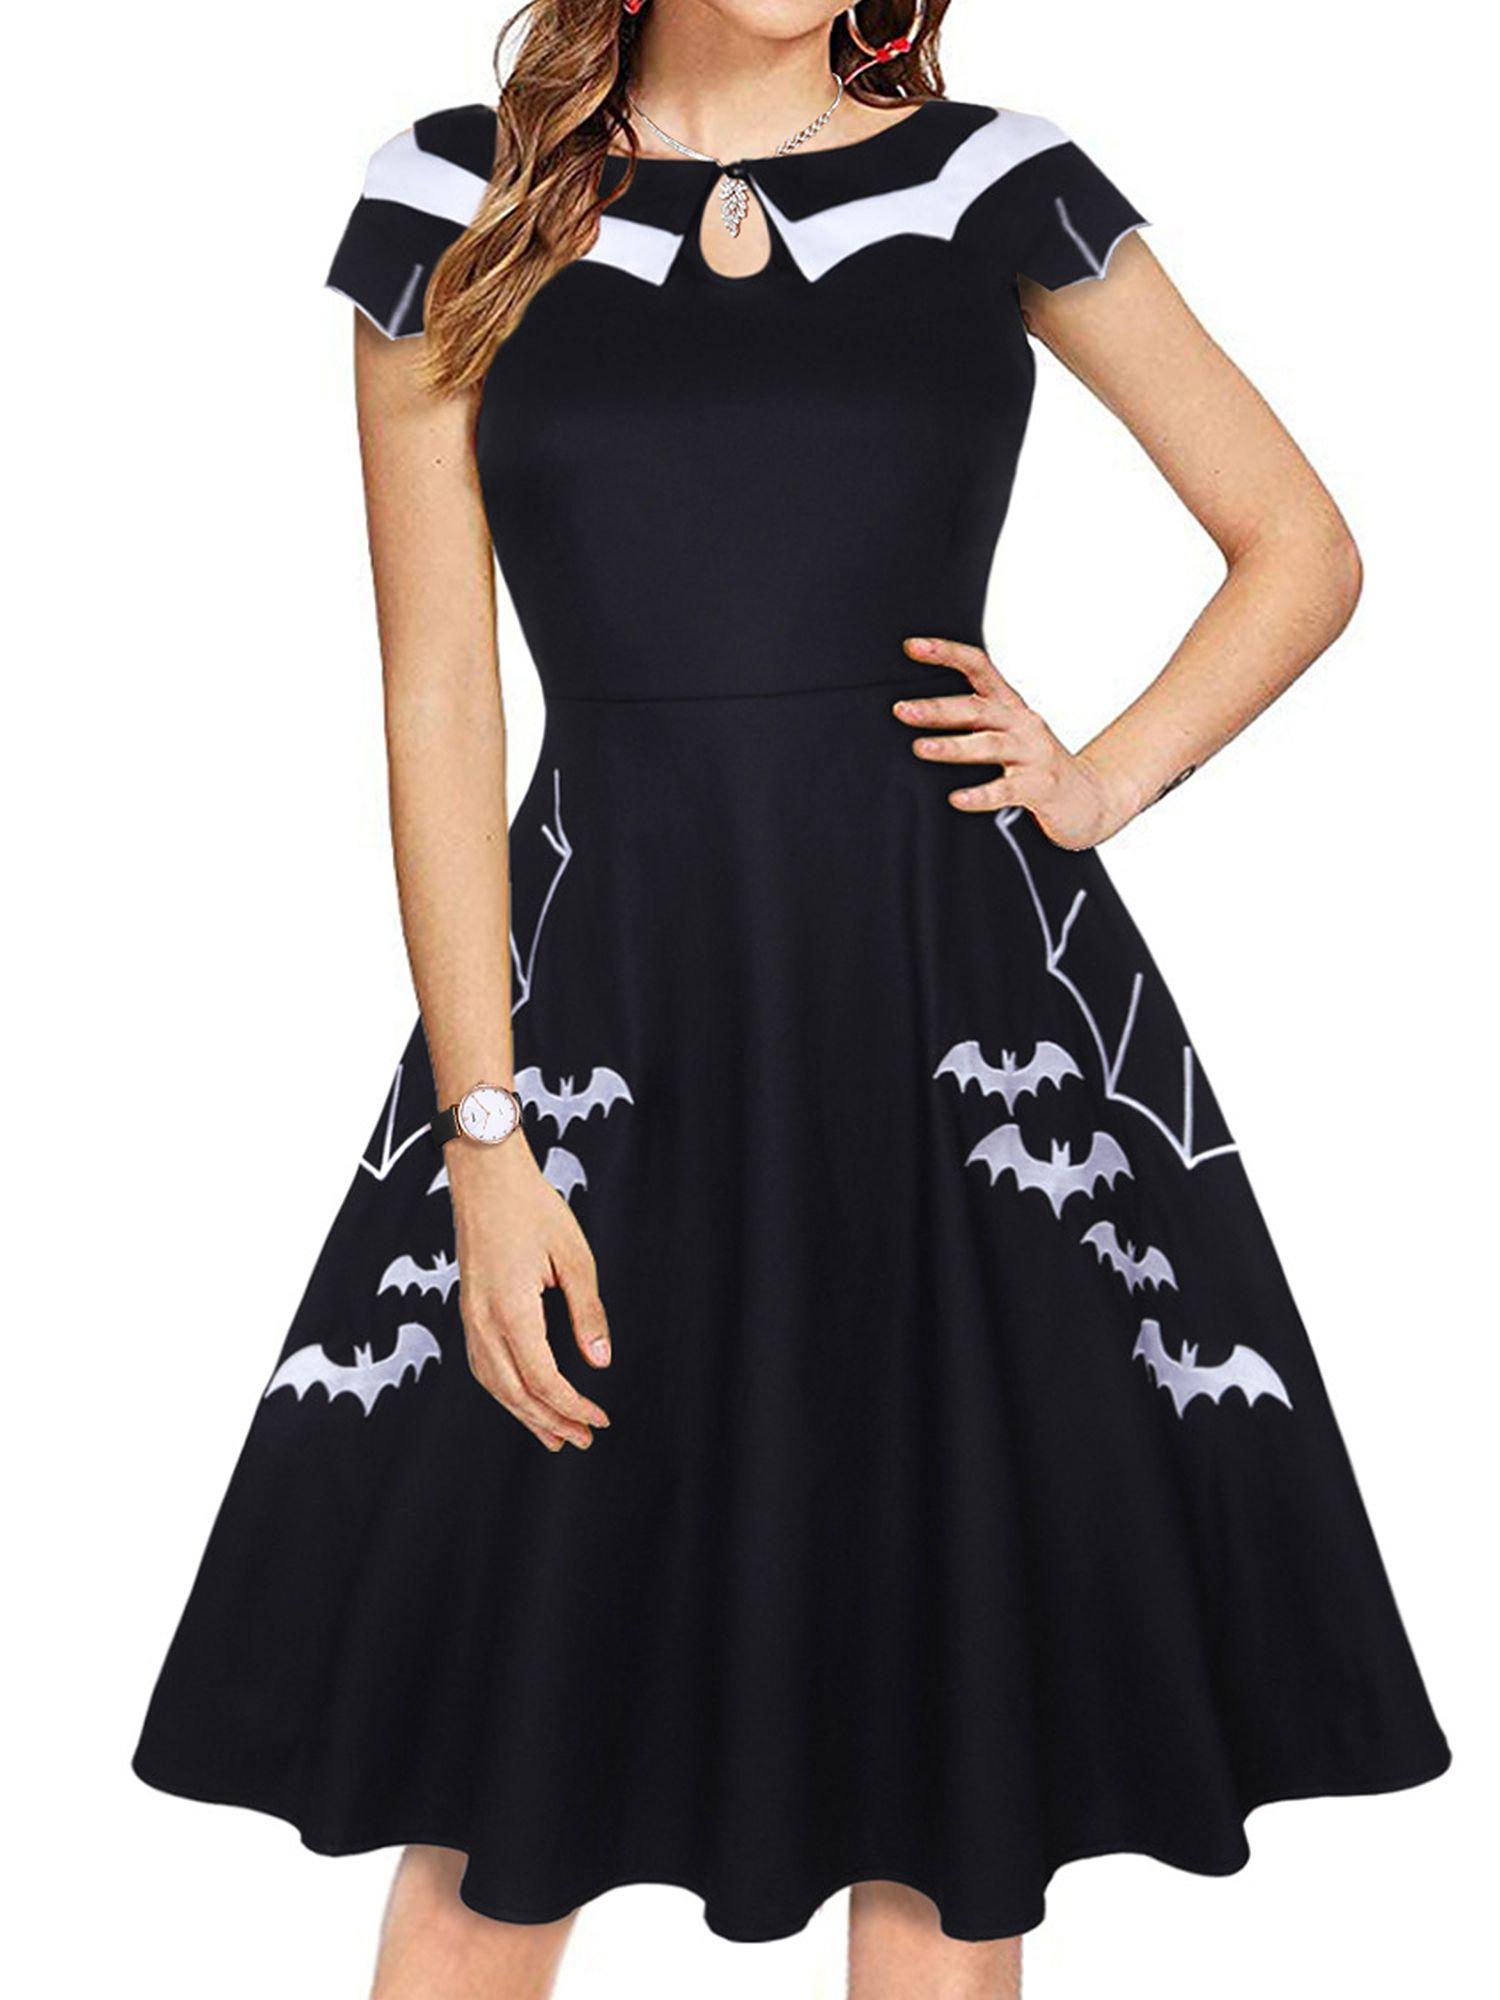 Free 2 Day Shipping Buy Women Vintage Retro Short Sleeve Halloween Bat Print Skater Dress Evening Plus Size Party Dresses Swing Dress Pattern Vintage Dresses [ 2000 x 1500 Pixel ]